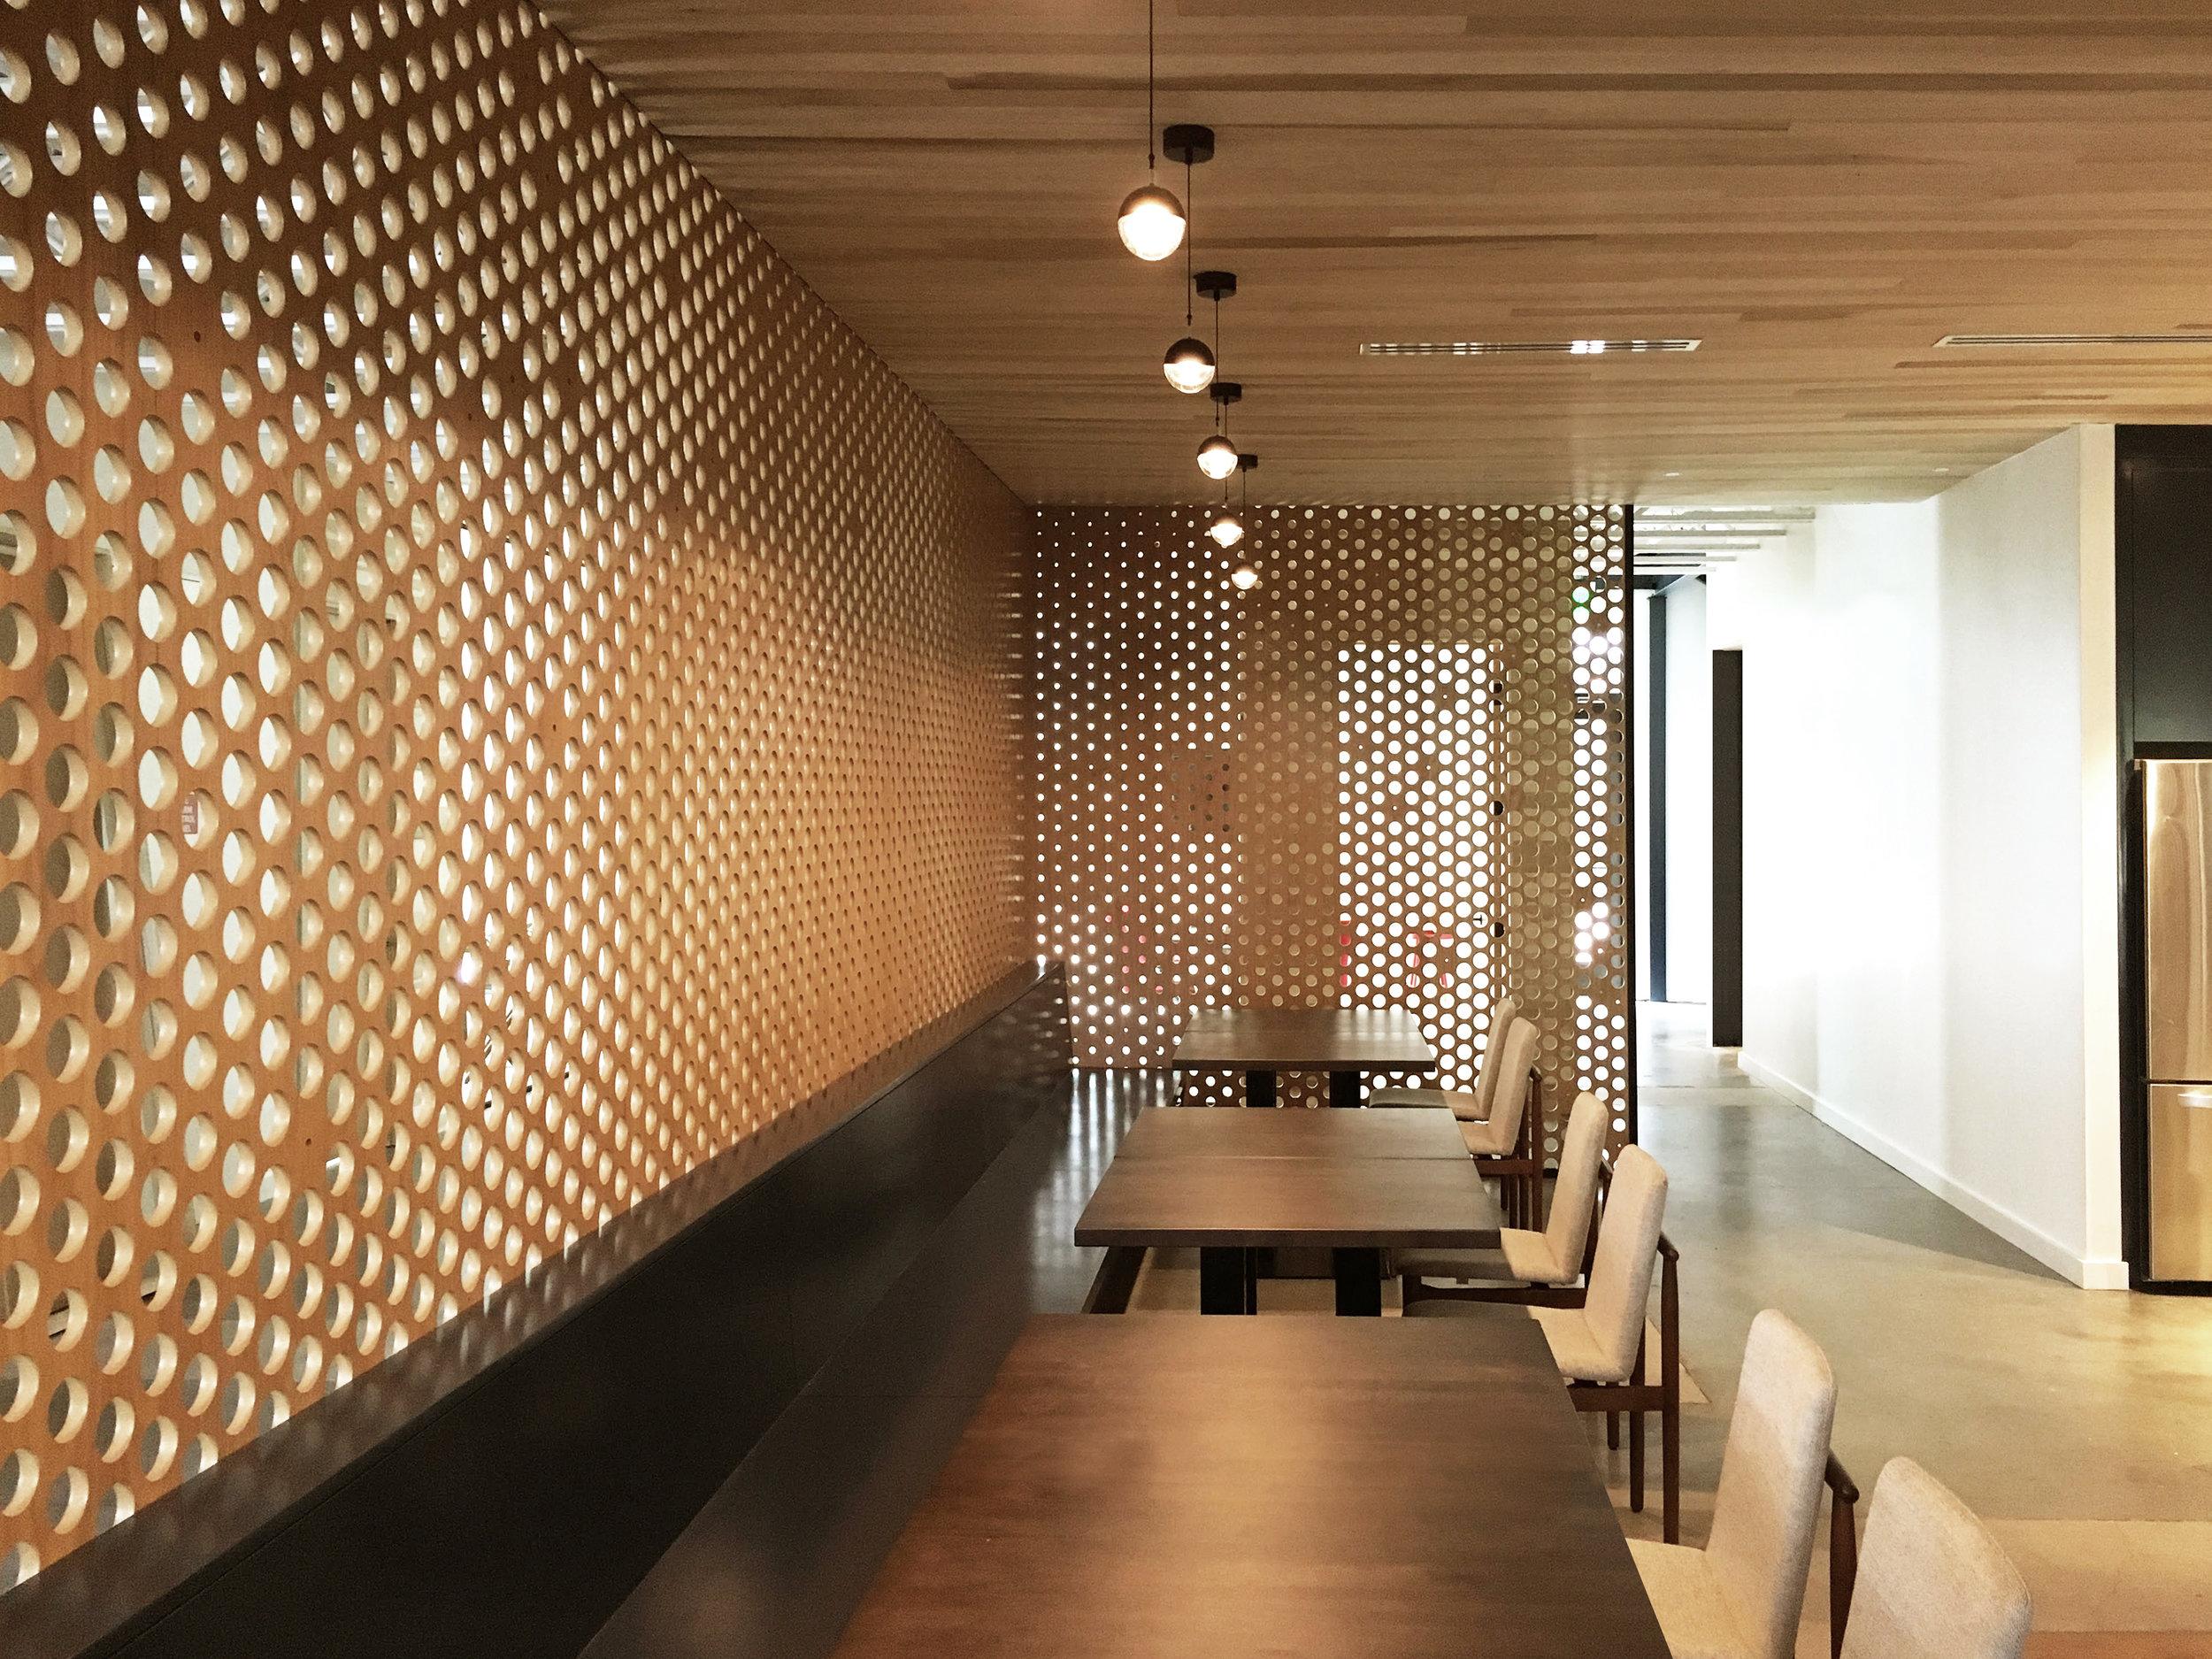 JDI Office by Matt Fajkus MF Architecture. Photo 8 by MFA.jpg